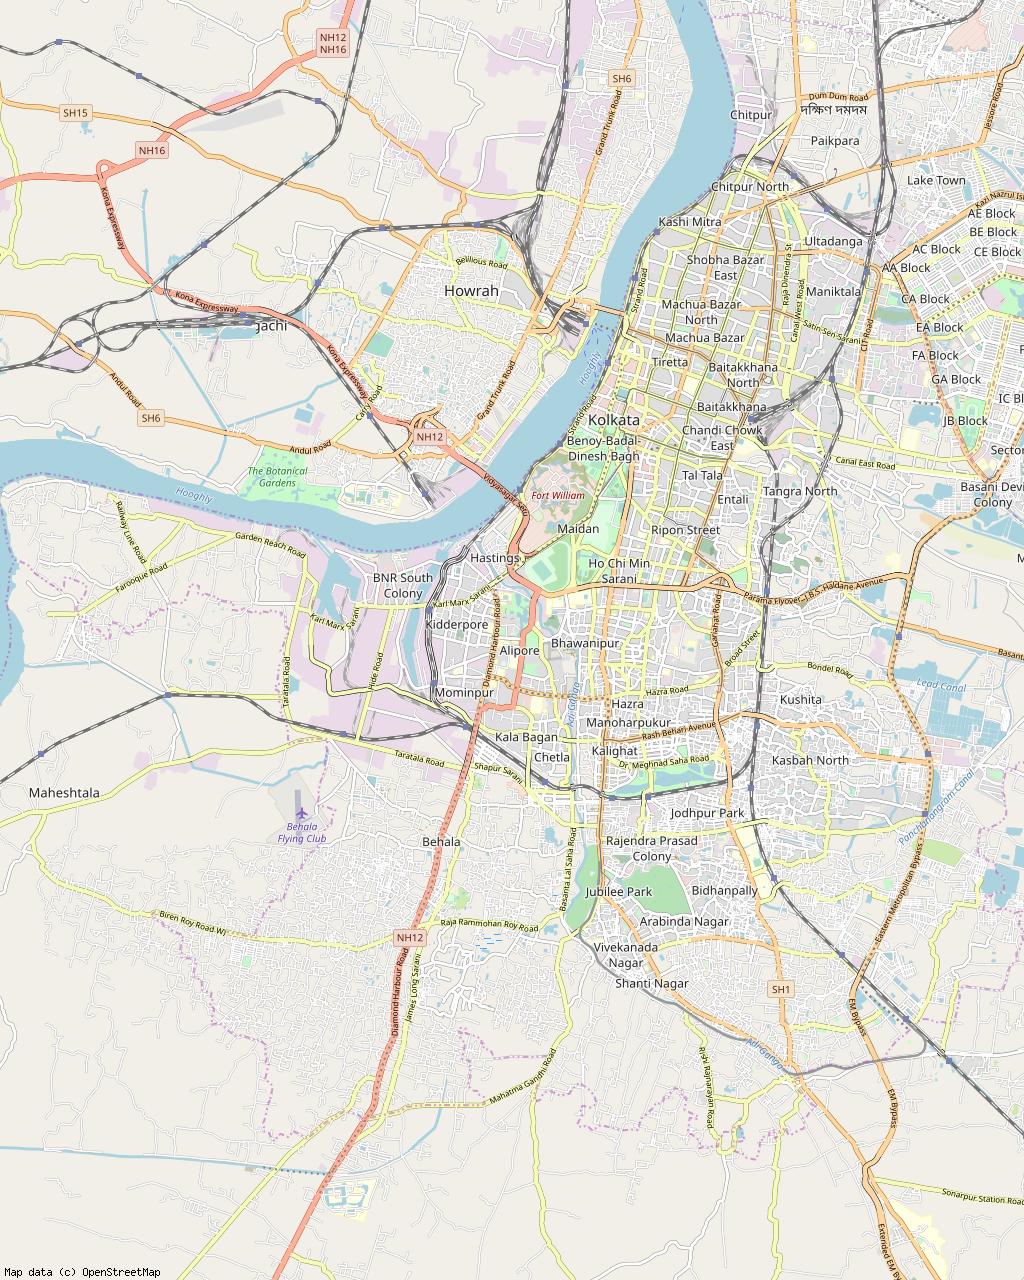 Ward No. 58, Kolkata Munil Corporation - Wikipedia Kmc Ward Map on system map, kaiserslautern military community map, kilauea military camp map, kern medical center map, thule map, cst map, diablo map, easton map, delta map, arrow map, hutchinson map, odyssey map, pioneer map, kaiserslautern germany map, garmin map, crazy map, platinum map, fox map, vision map, goodyear map,